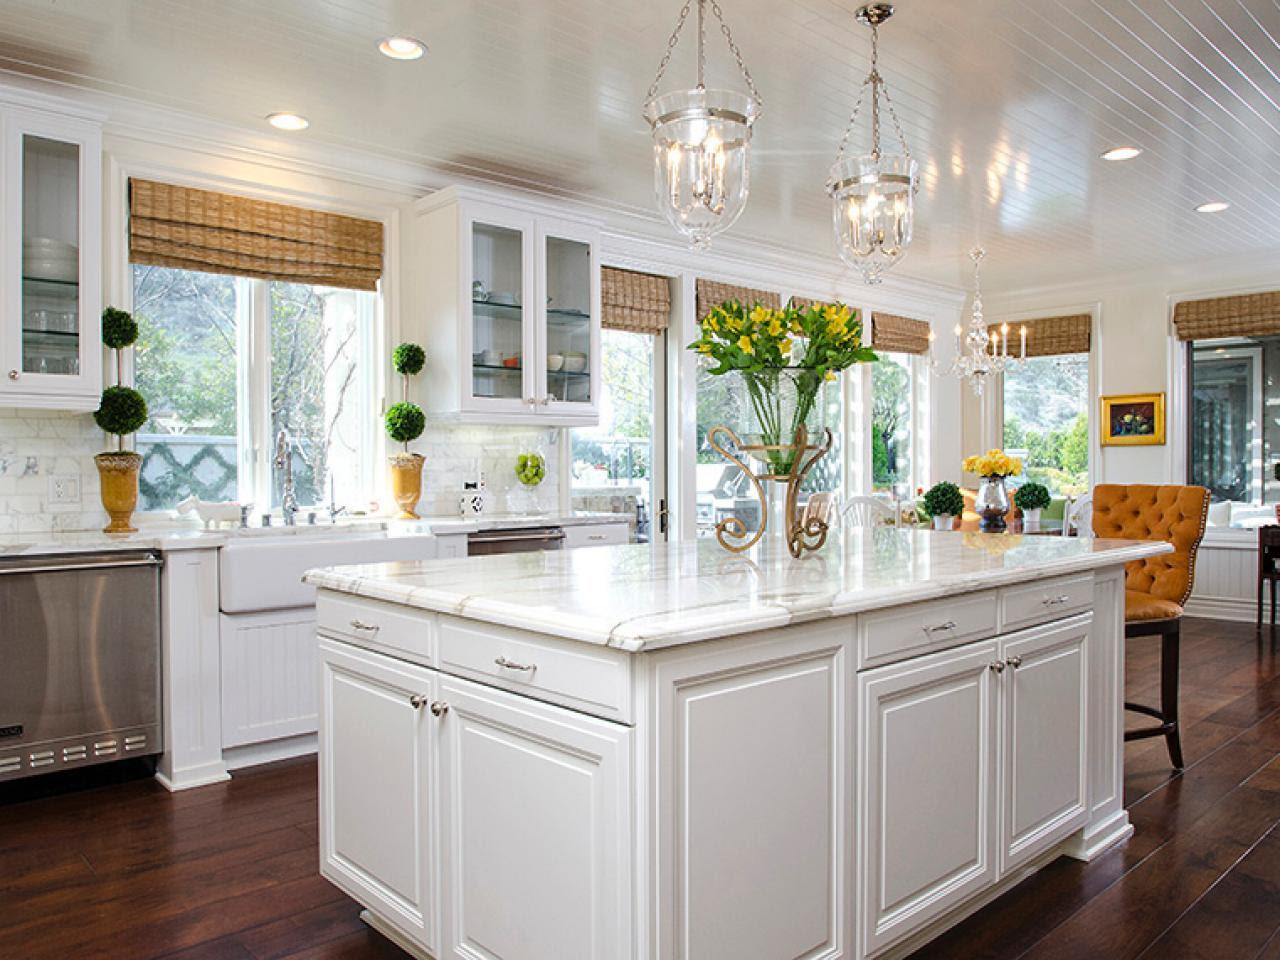 Window Treatment Ideas For Kitchens (29)++ Design Secrets  DOWNLOAD